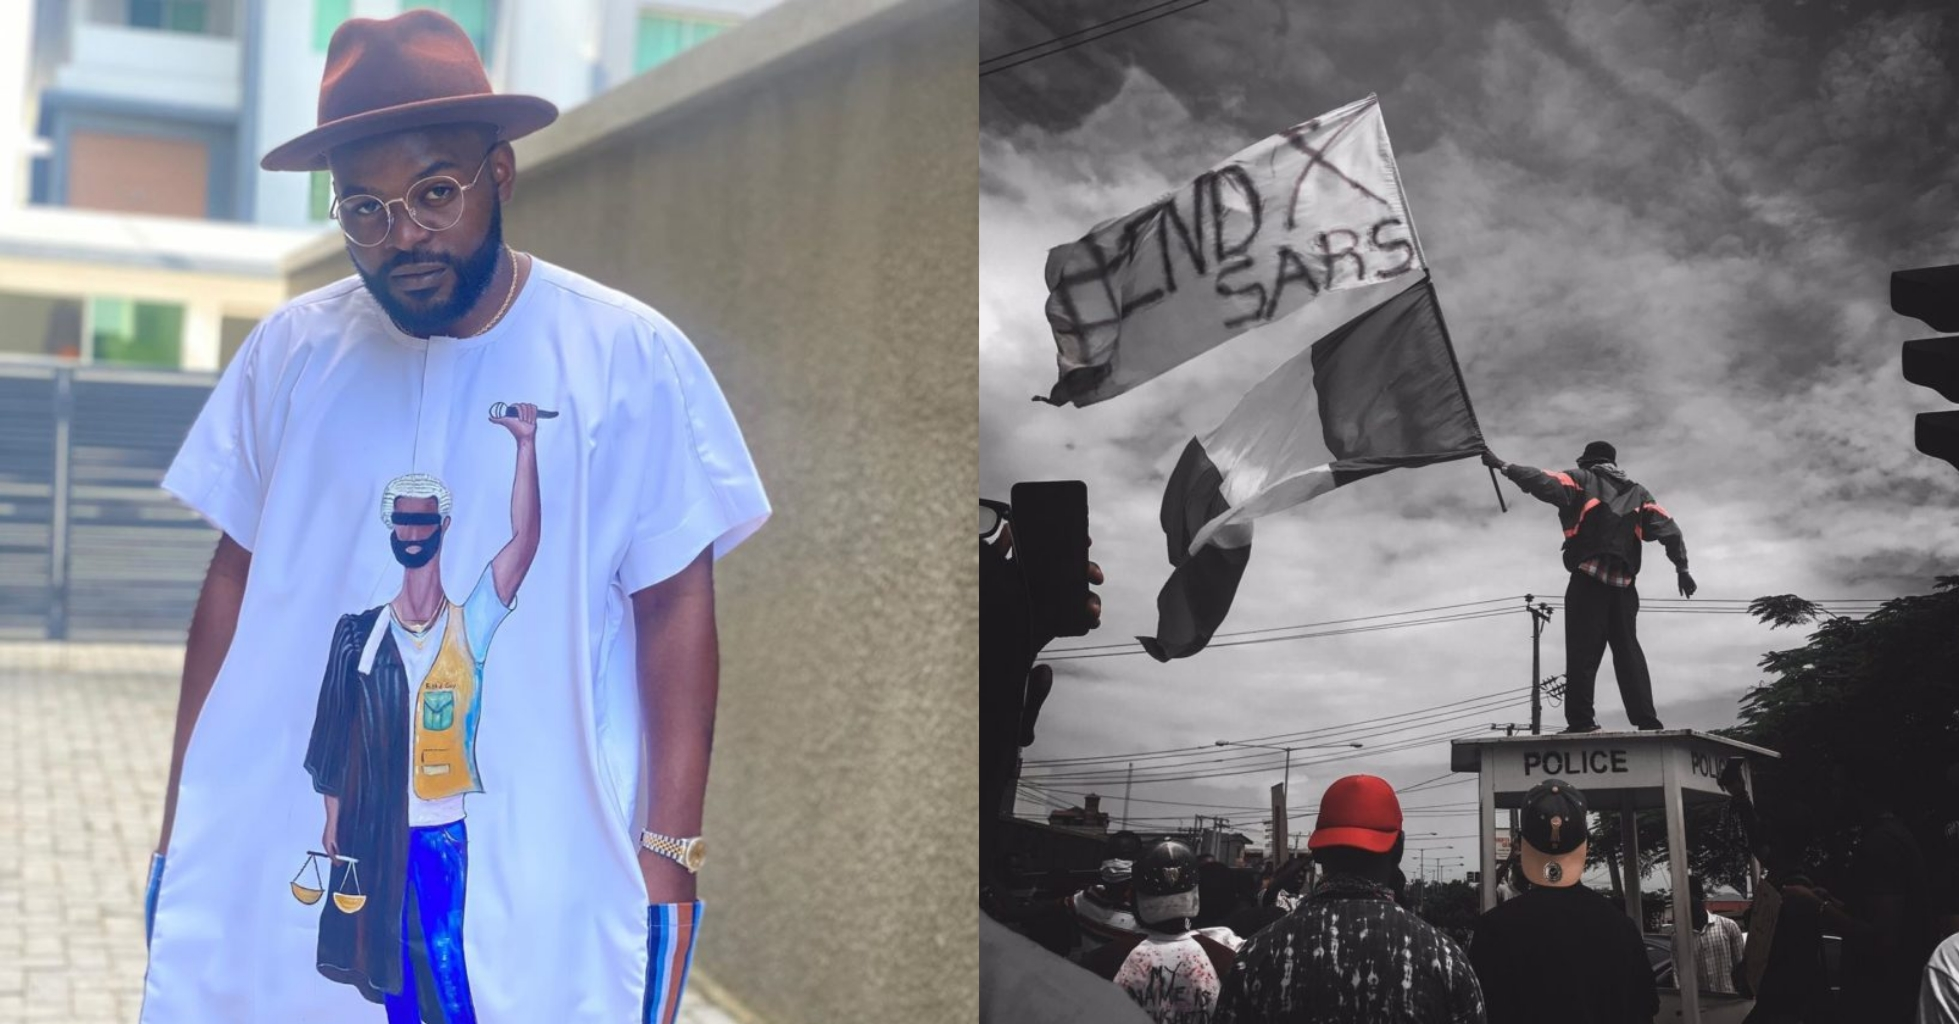 #EndSARS: We'll Be Back After The Curfew – Falz Tells Sanwo-olu (Video)